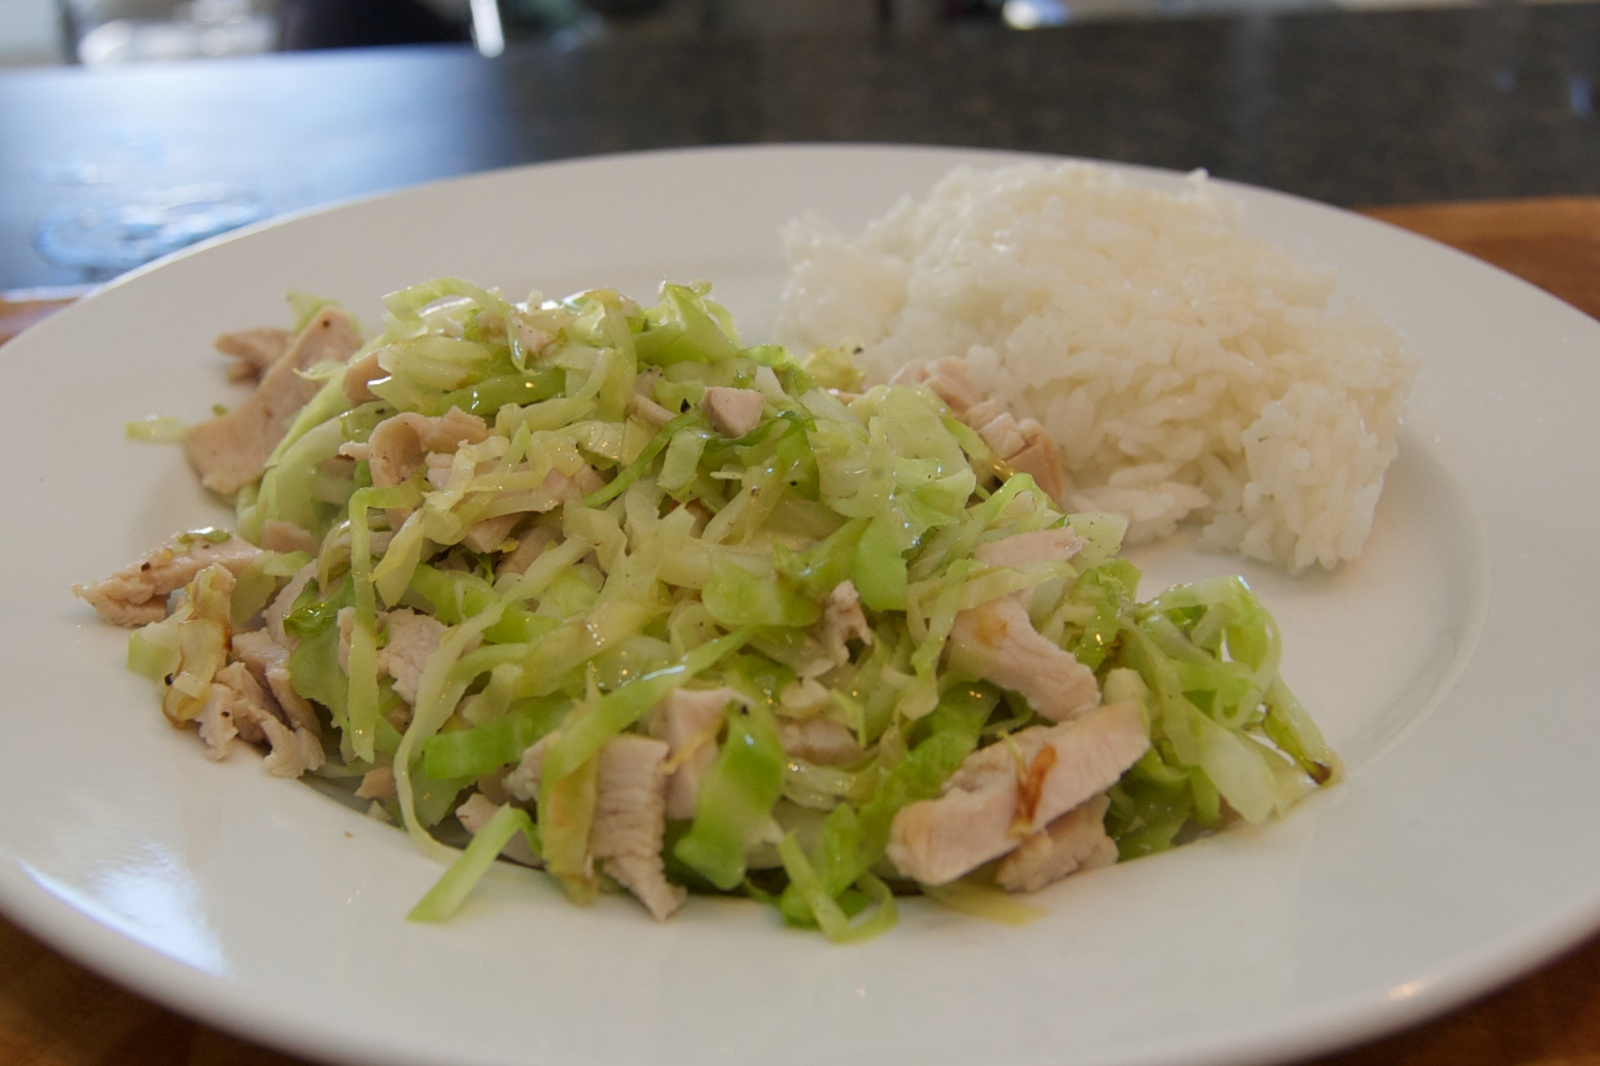 http://blog.rickk.com/food/2011/05/10/ate.2011.05.10.l.jpg